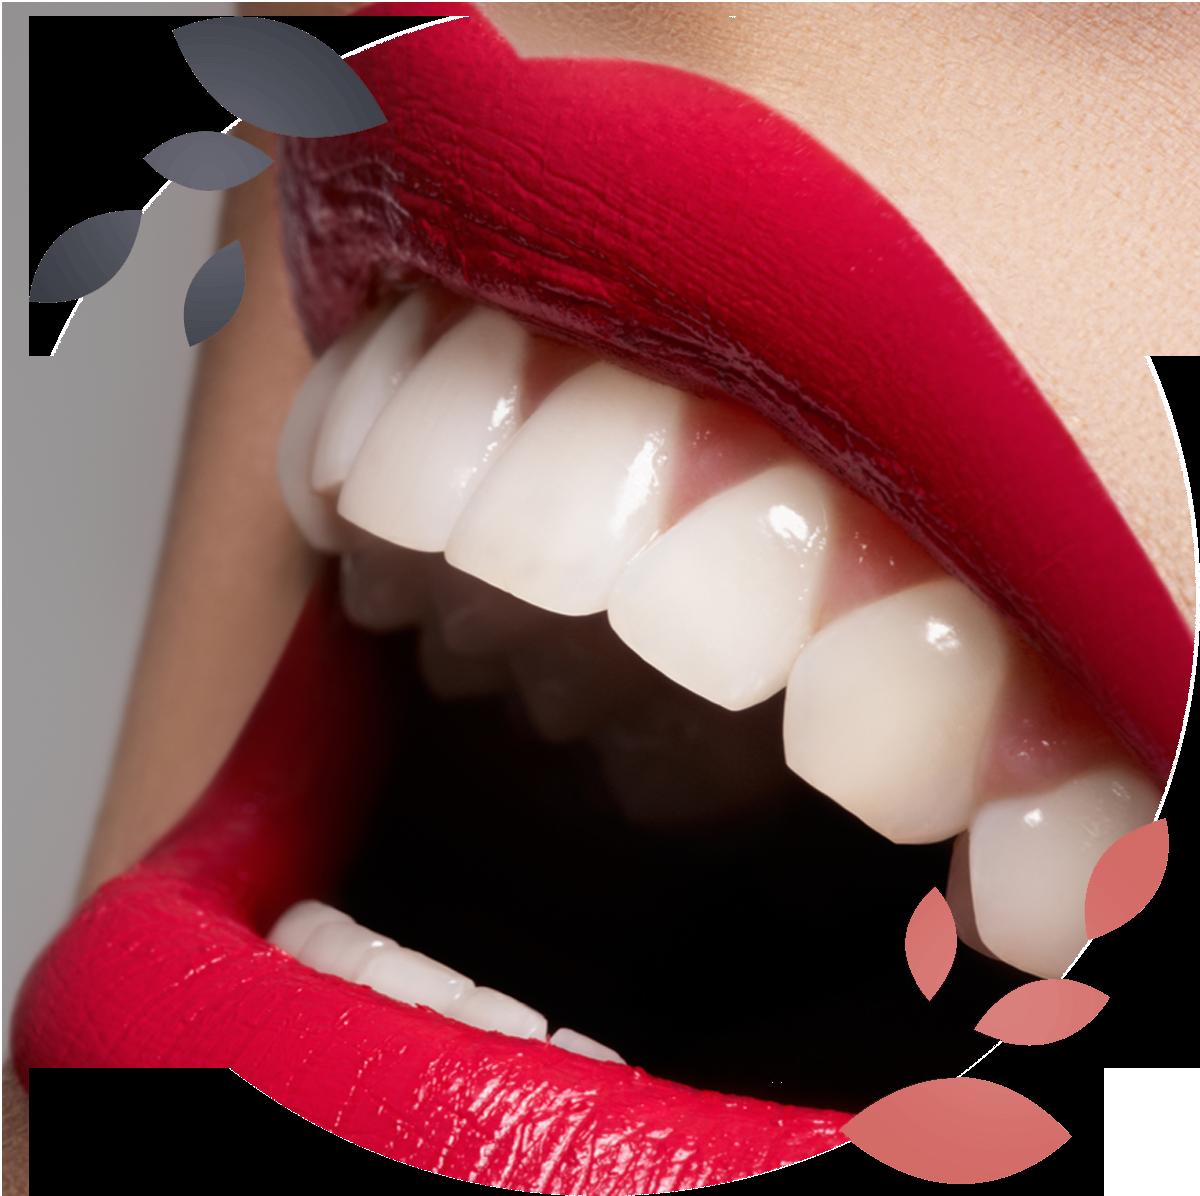 https://lotus-detente.com/wp-content/uploads/2020/08/dentaire-circle-3.png